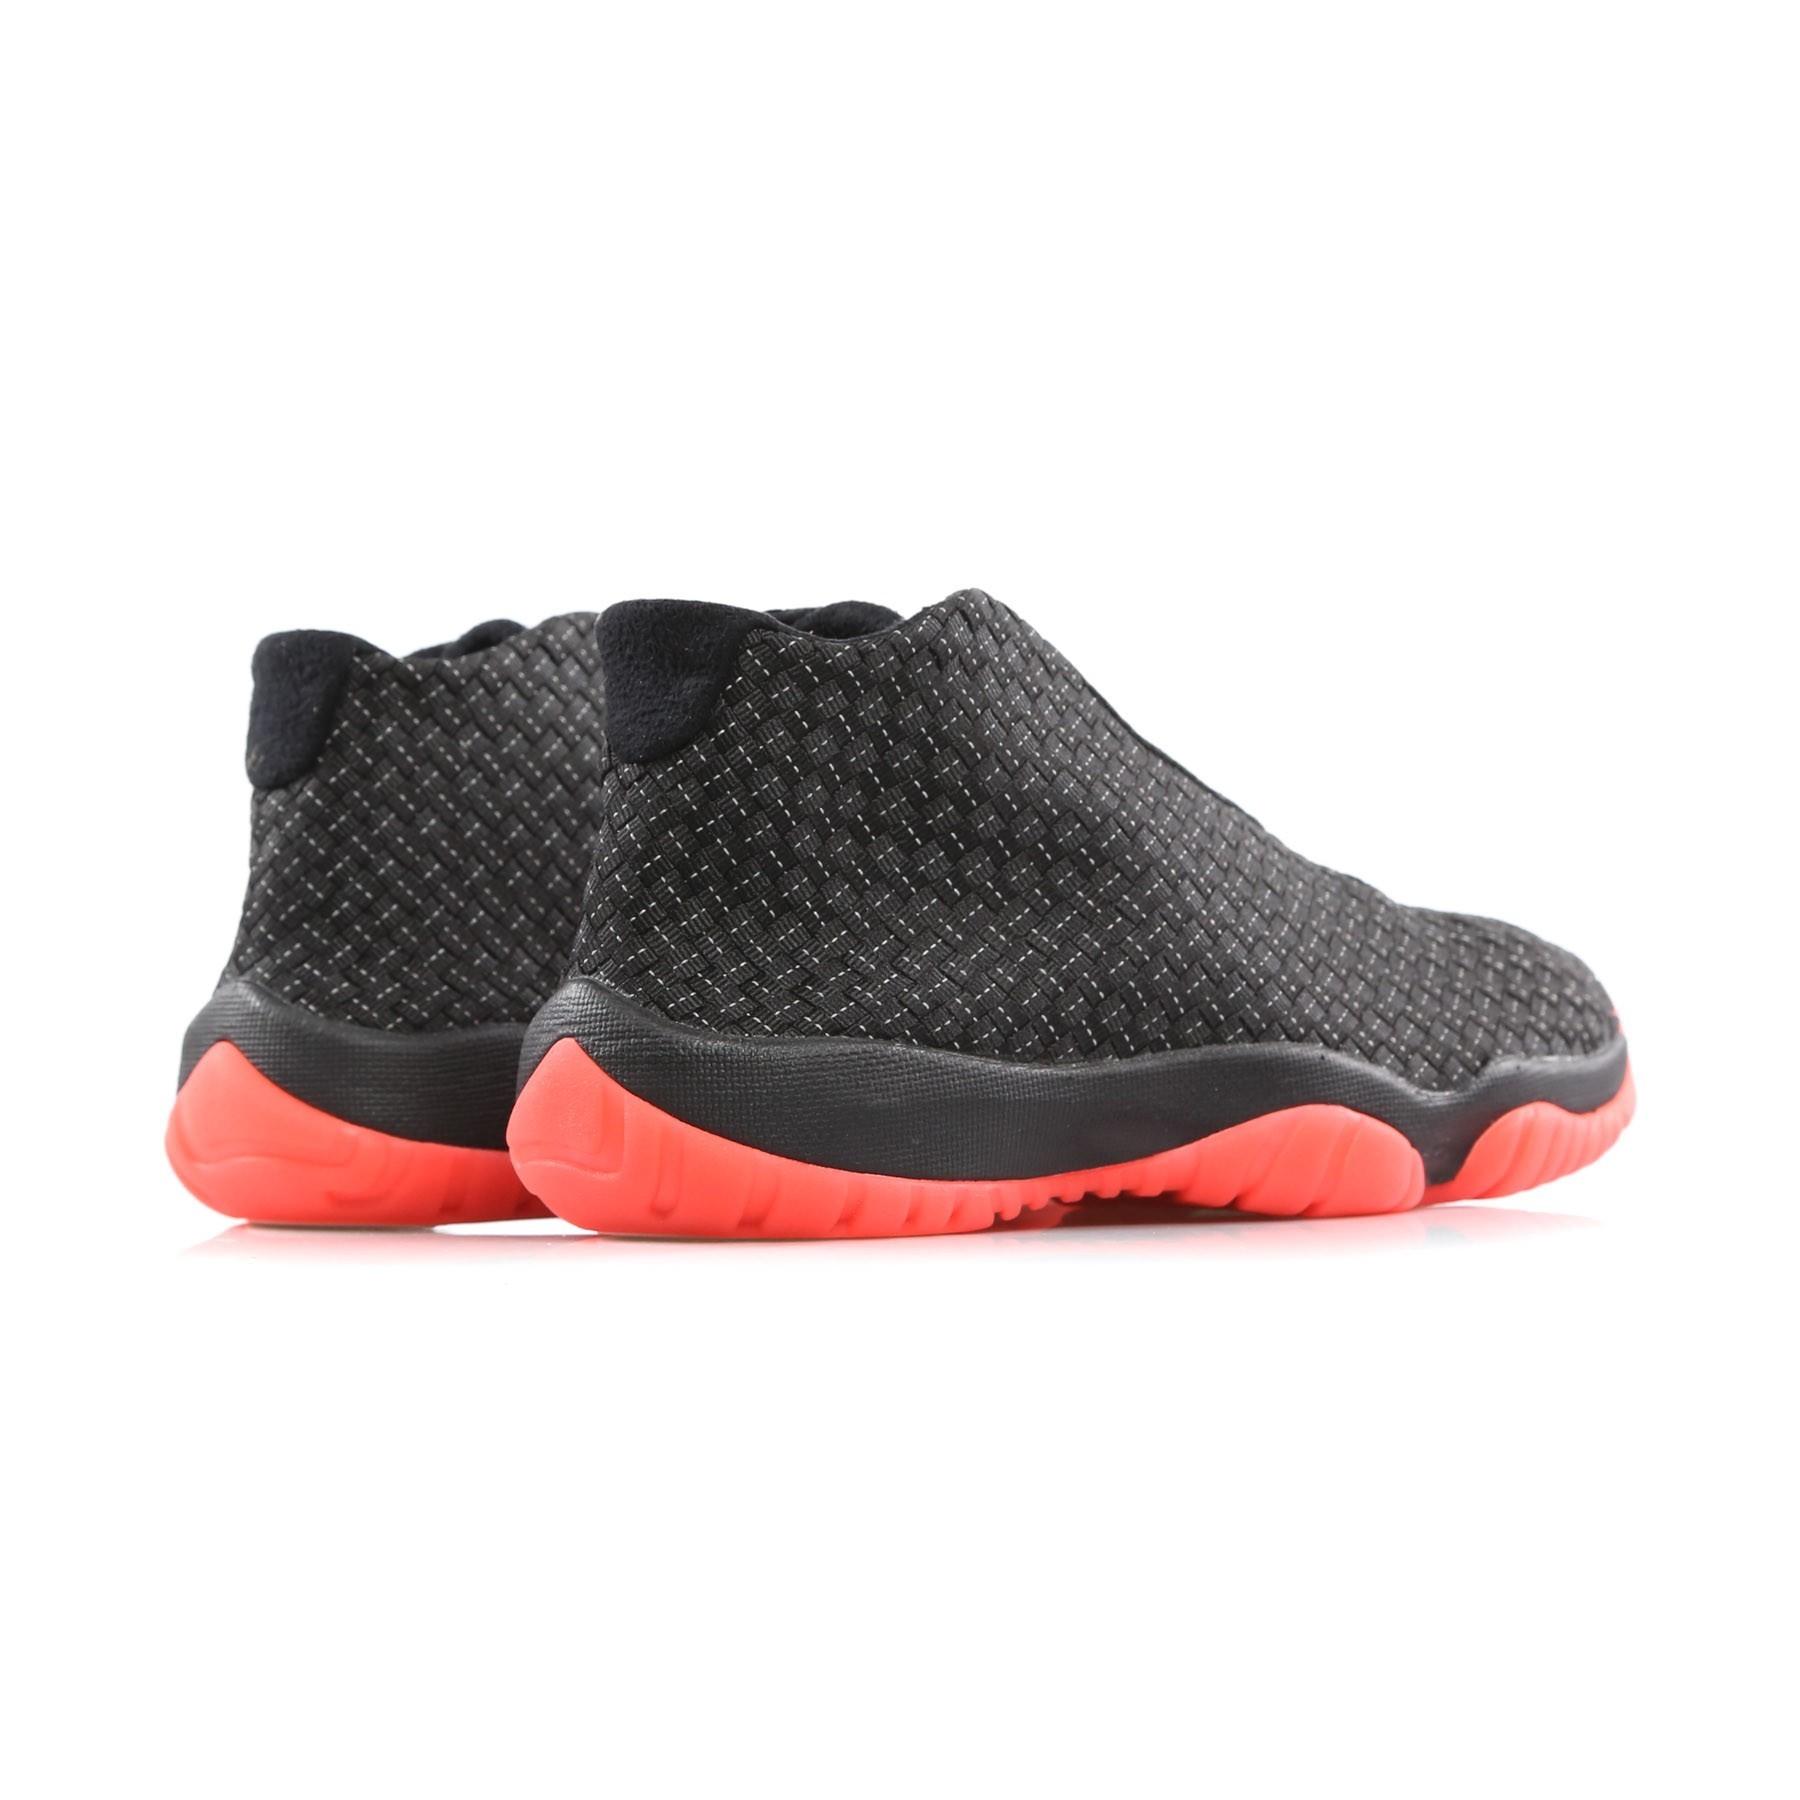 5fe86d918eeeb6 ... black glow 5b960 cad5f  norway scarpa alta air jordan future premium  f1f1d 1e364